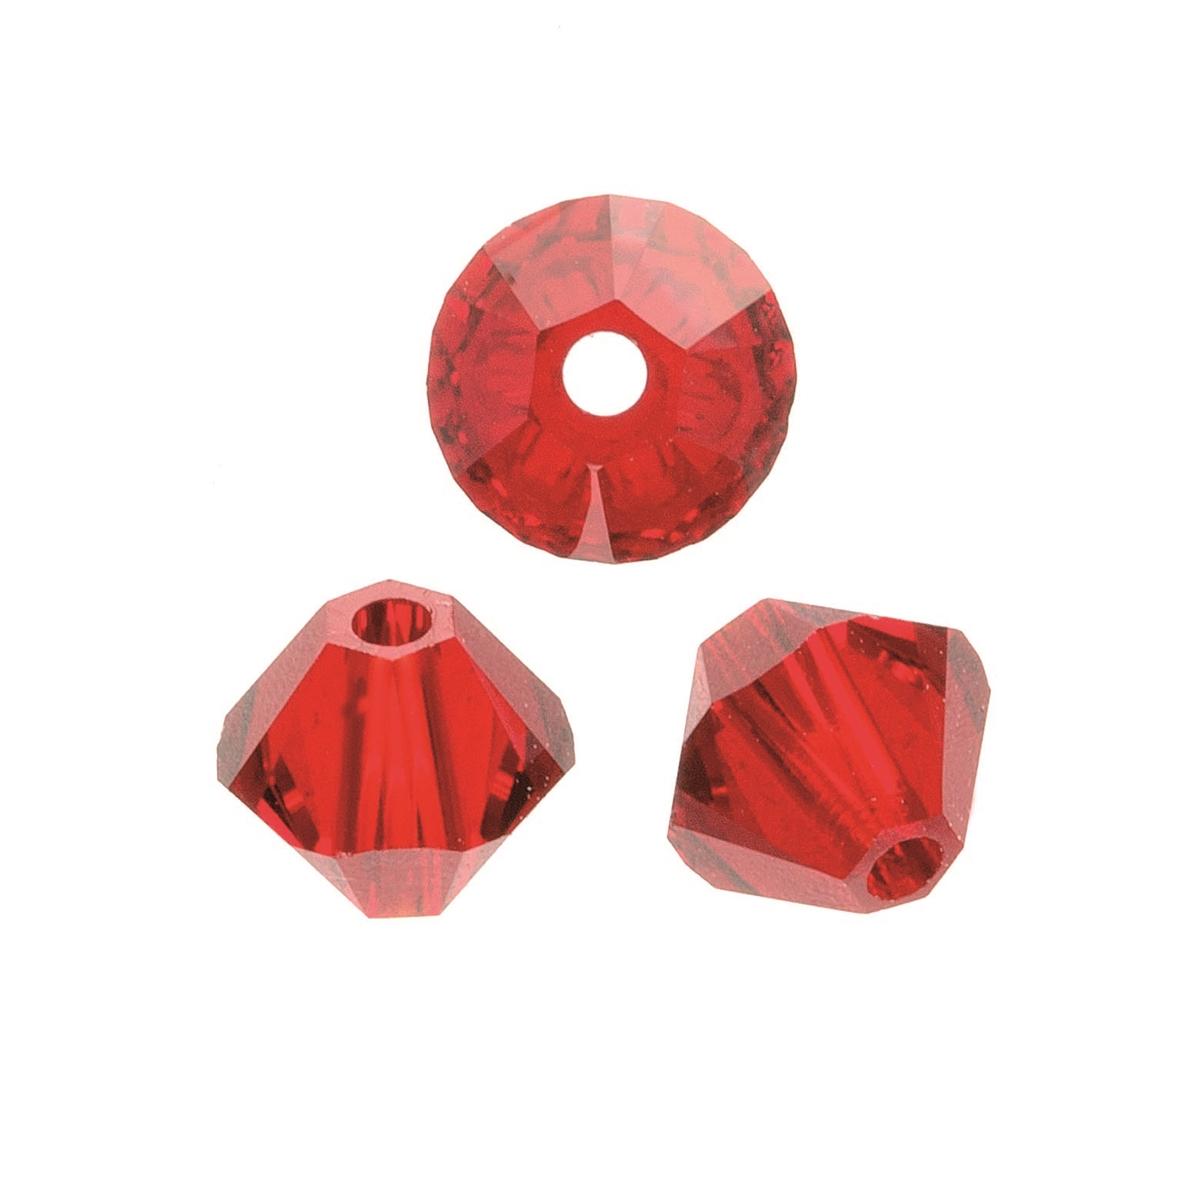 Perles Swarovski 4 mm rouge - Boîte de 25